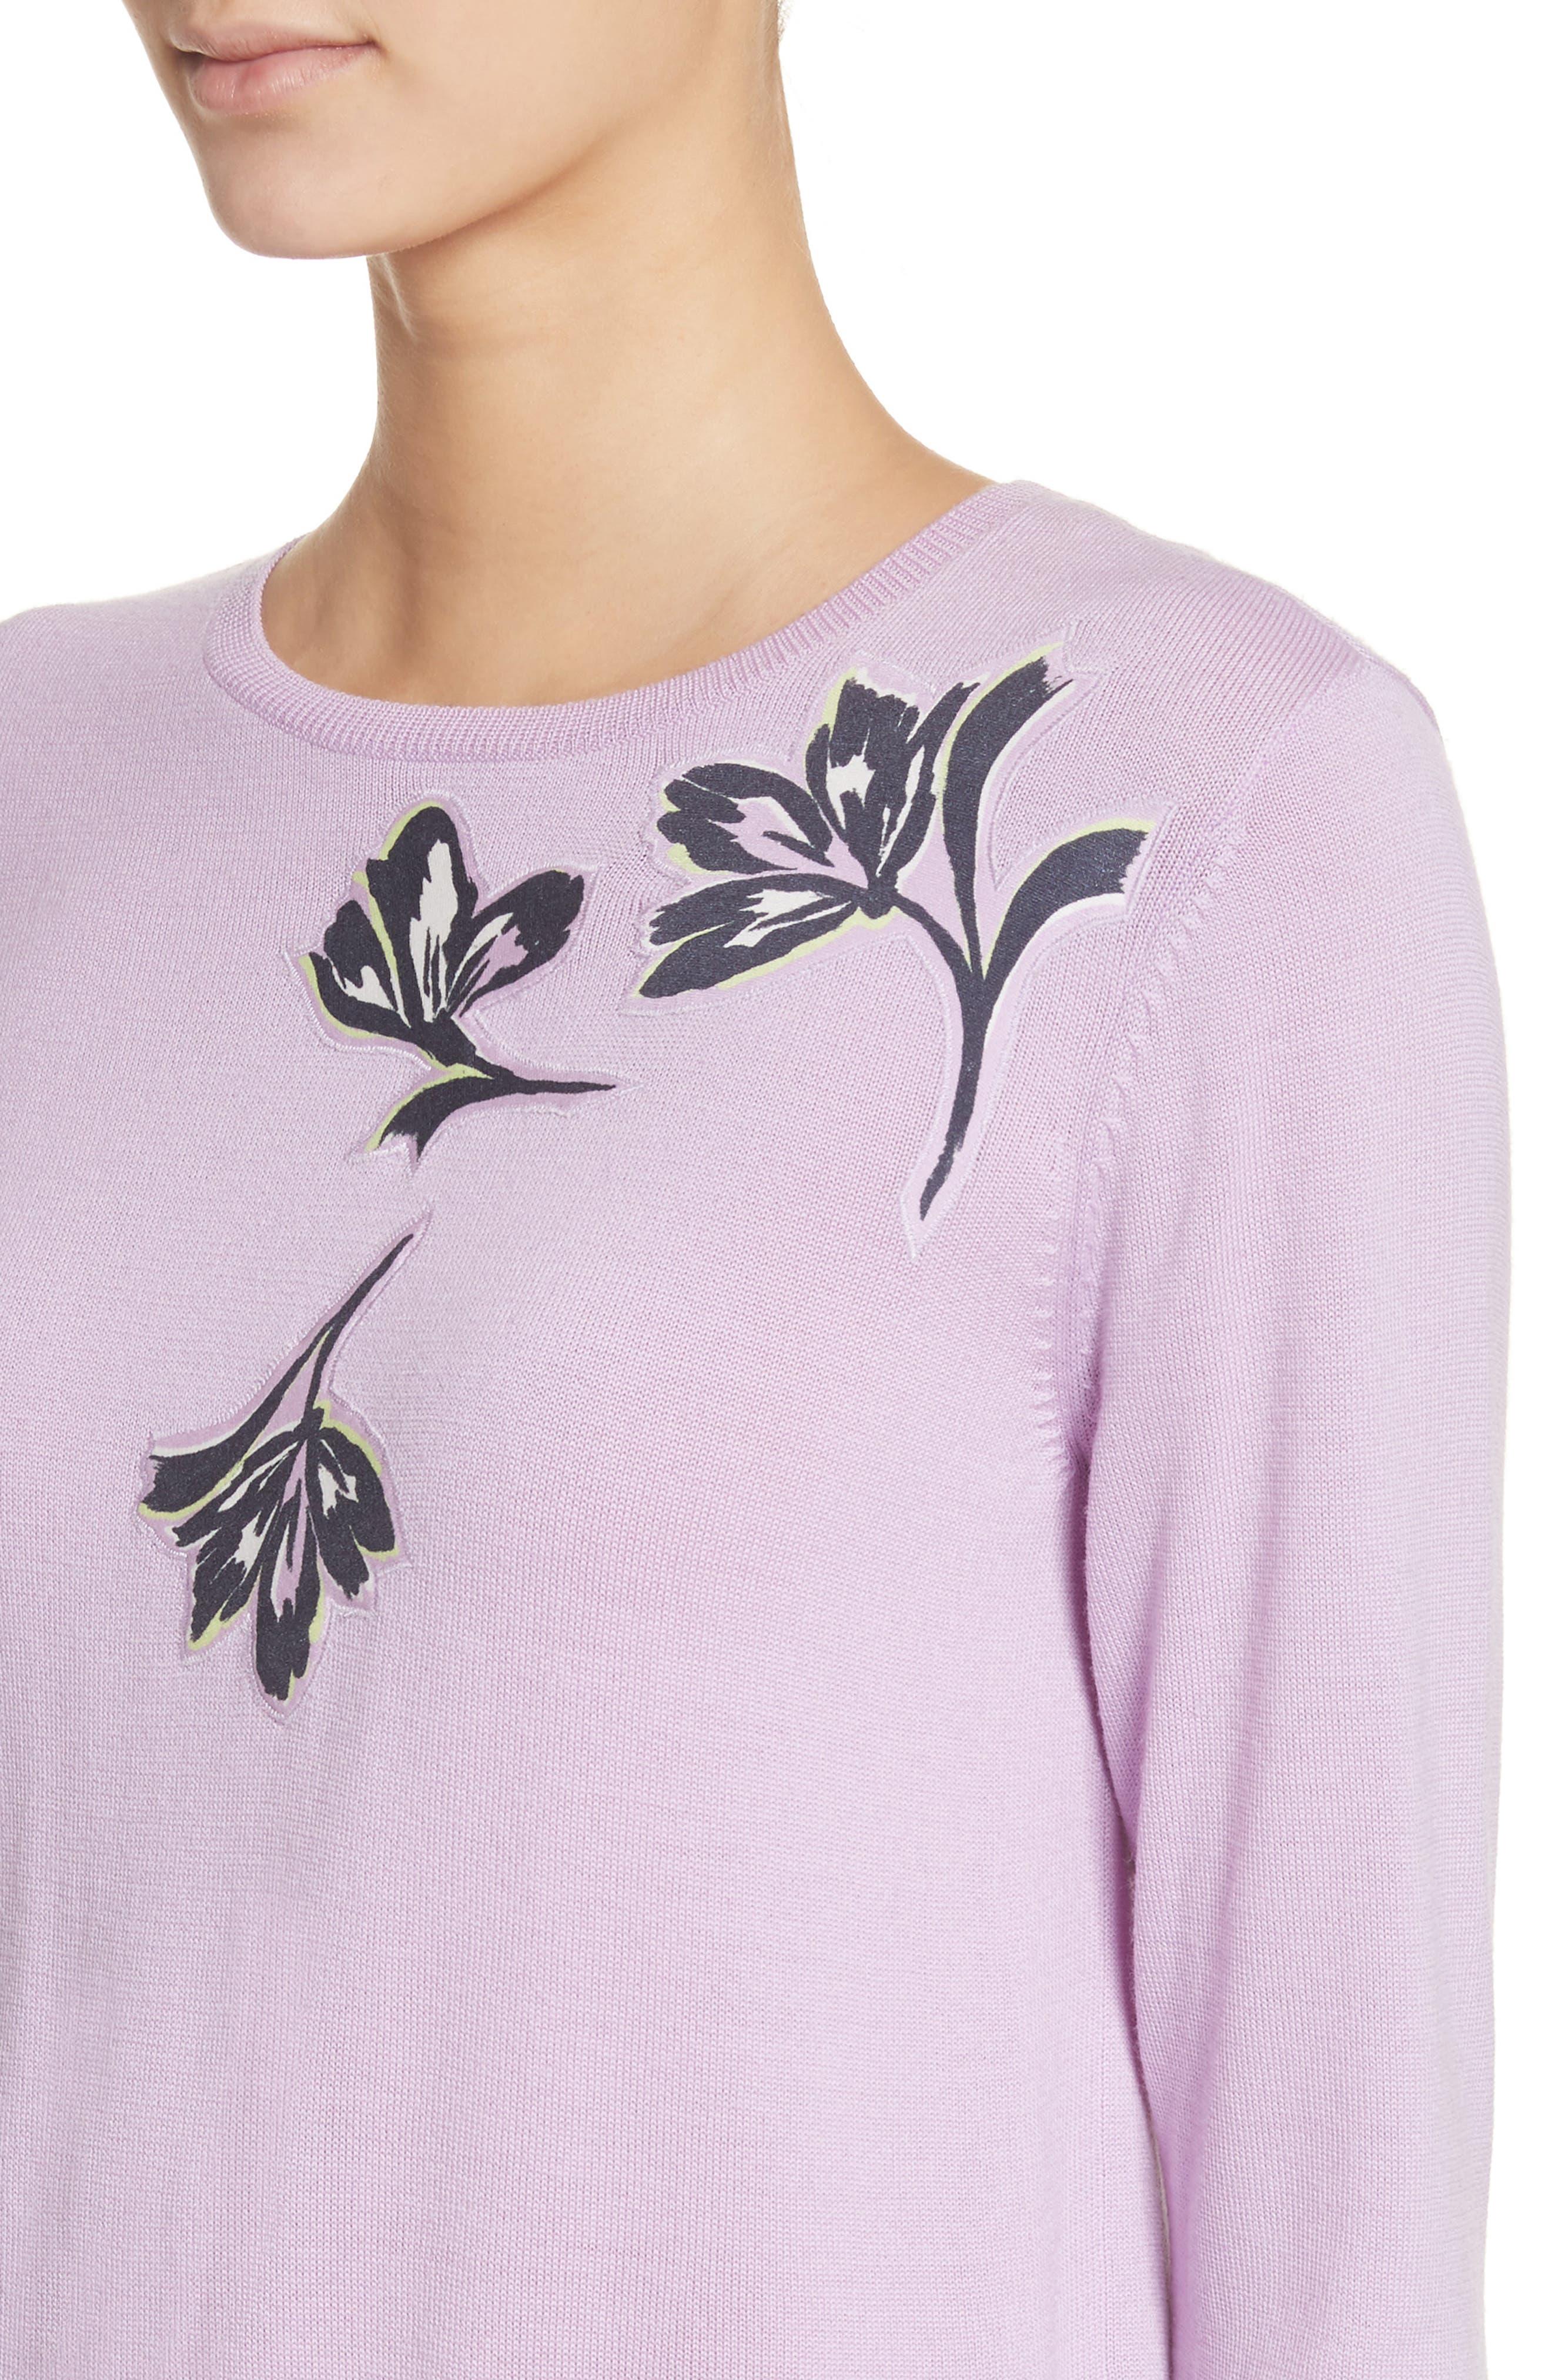 Floral Appliqué Wool Sweater,                             Alternate thumbnail 4, color,                             Orchid Multi